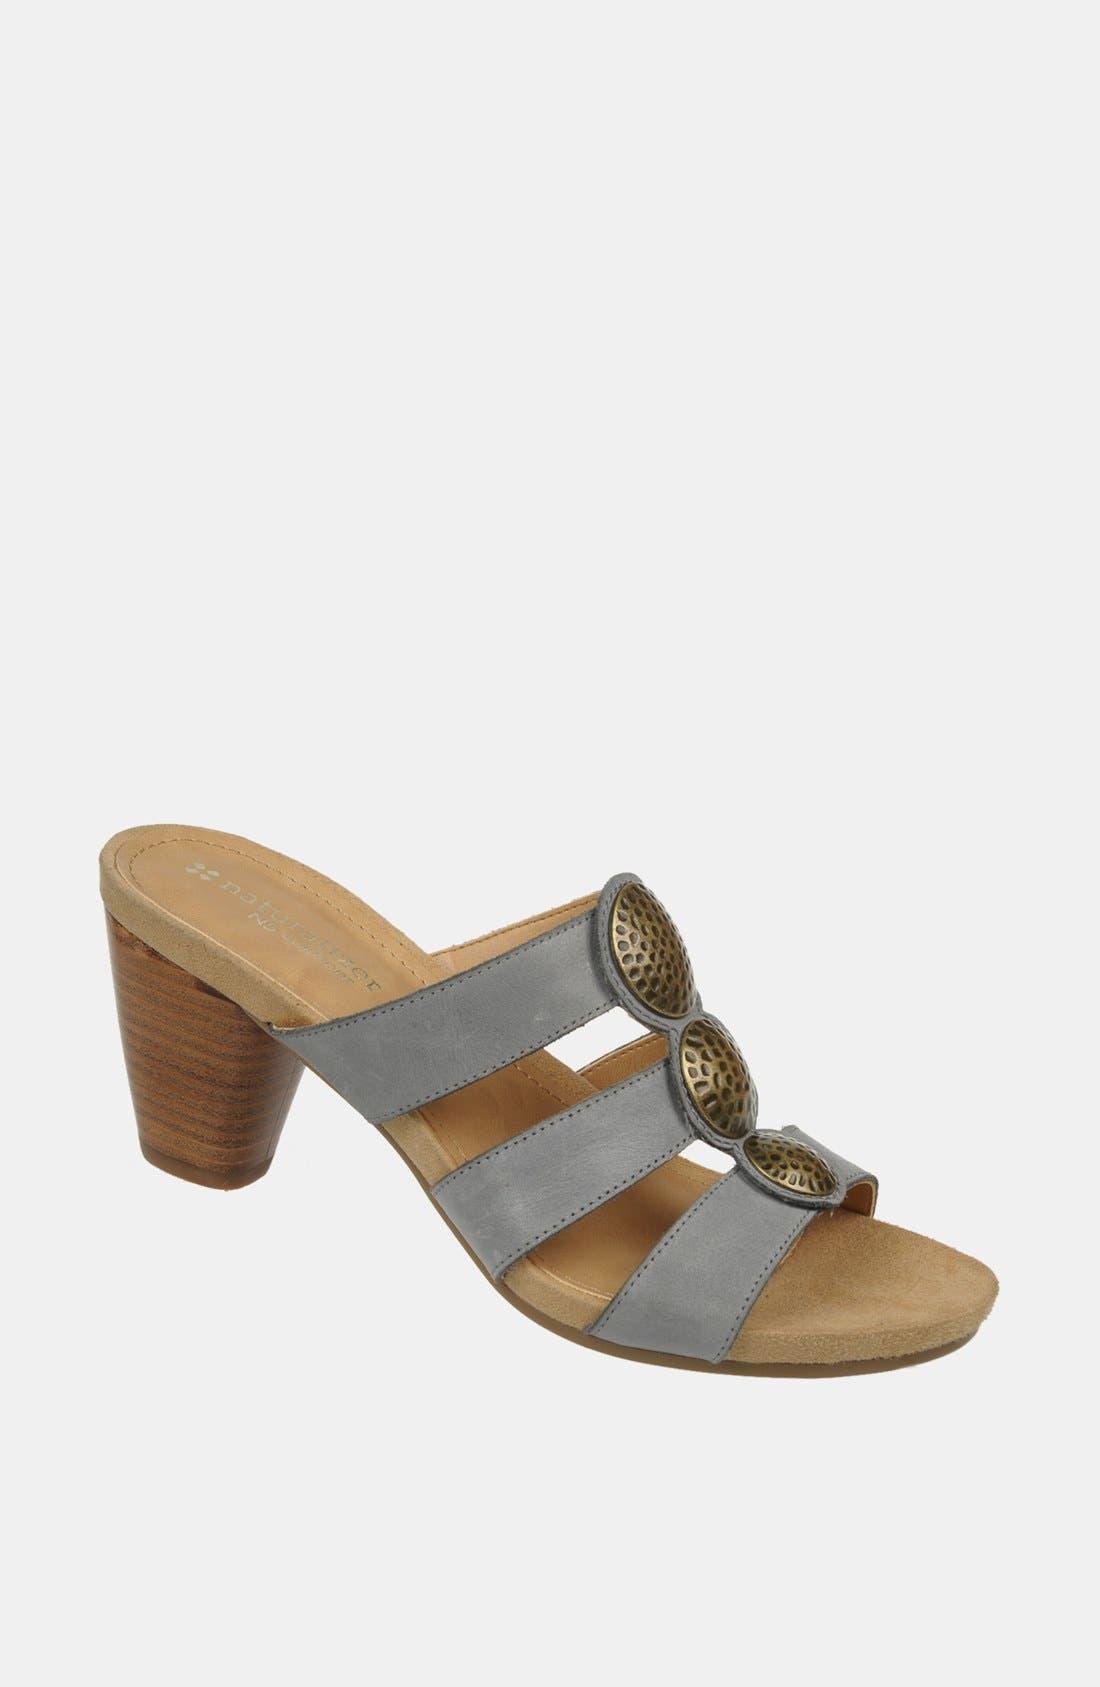 Main Image - Naturalizer 'Egypt' Sandal